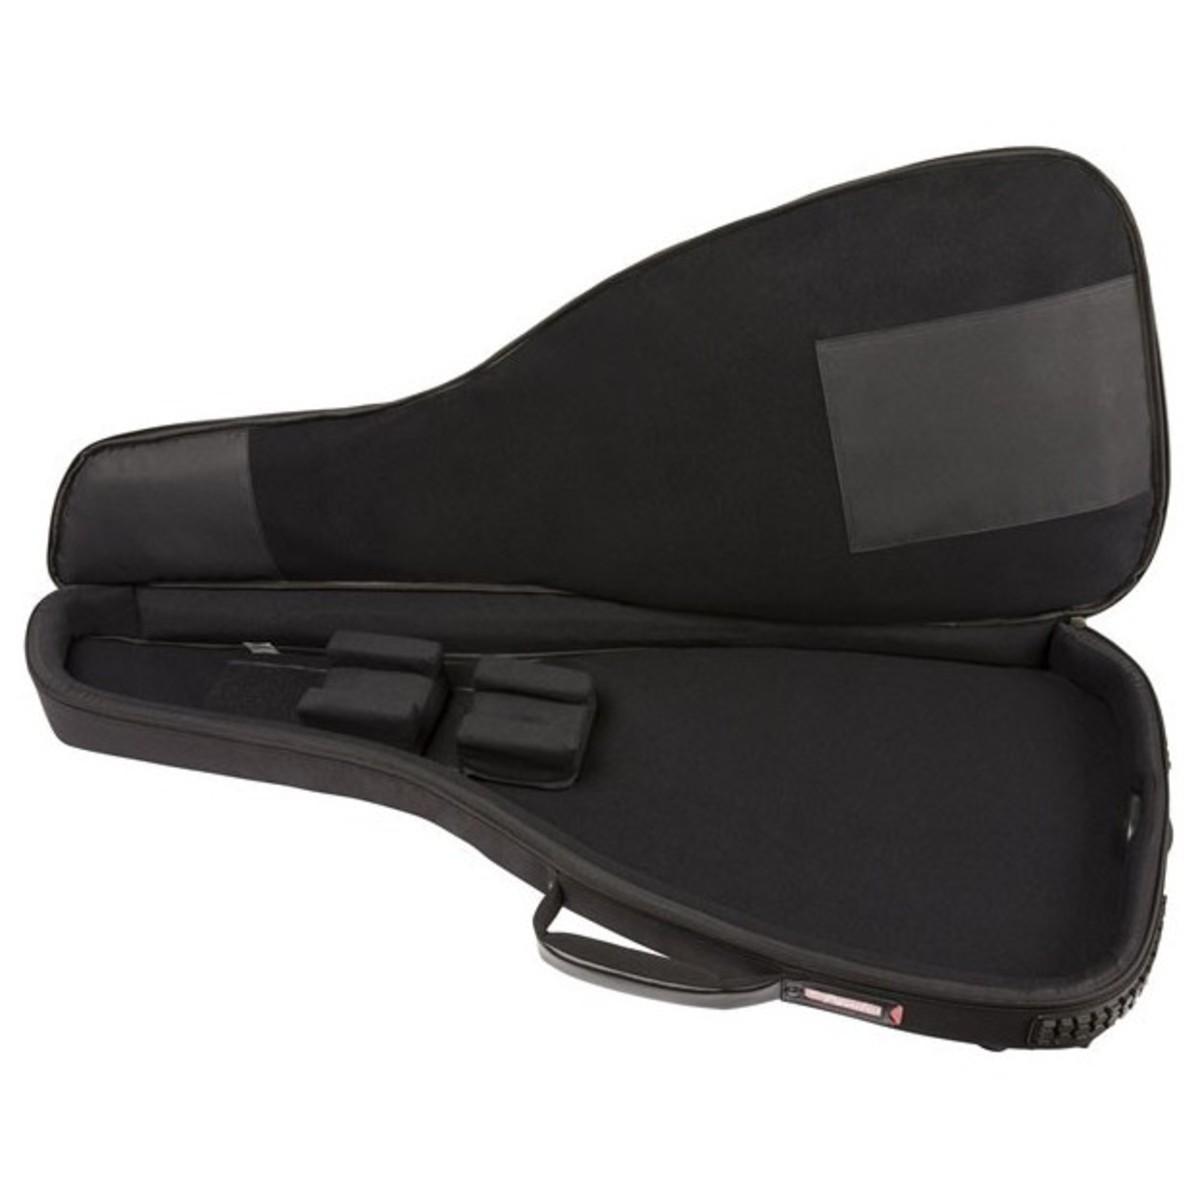 Black Fender FE1225 Electric Guitar Gig Bag Tasche für E-Gitarre